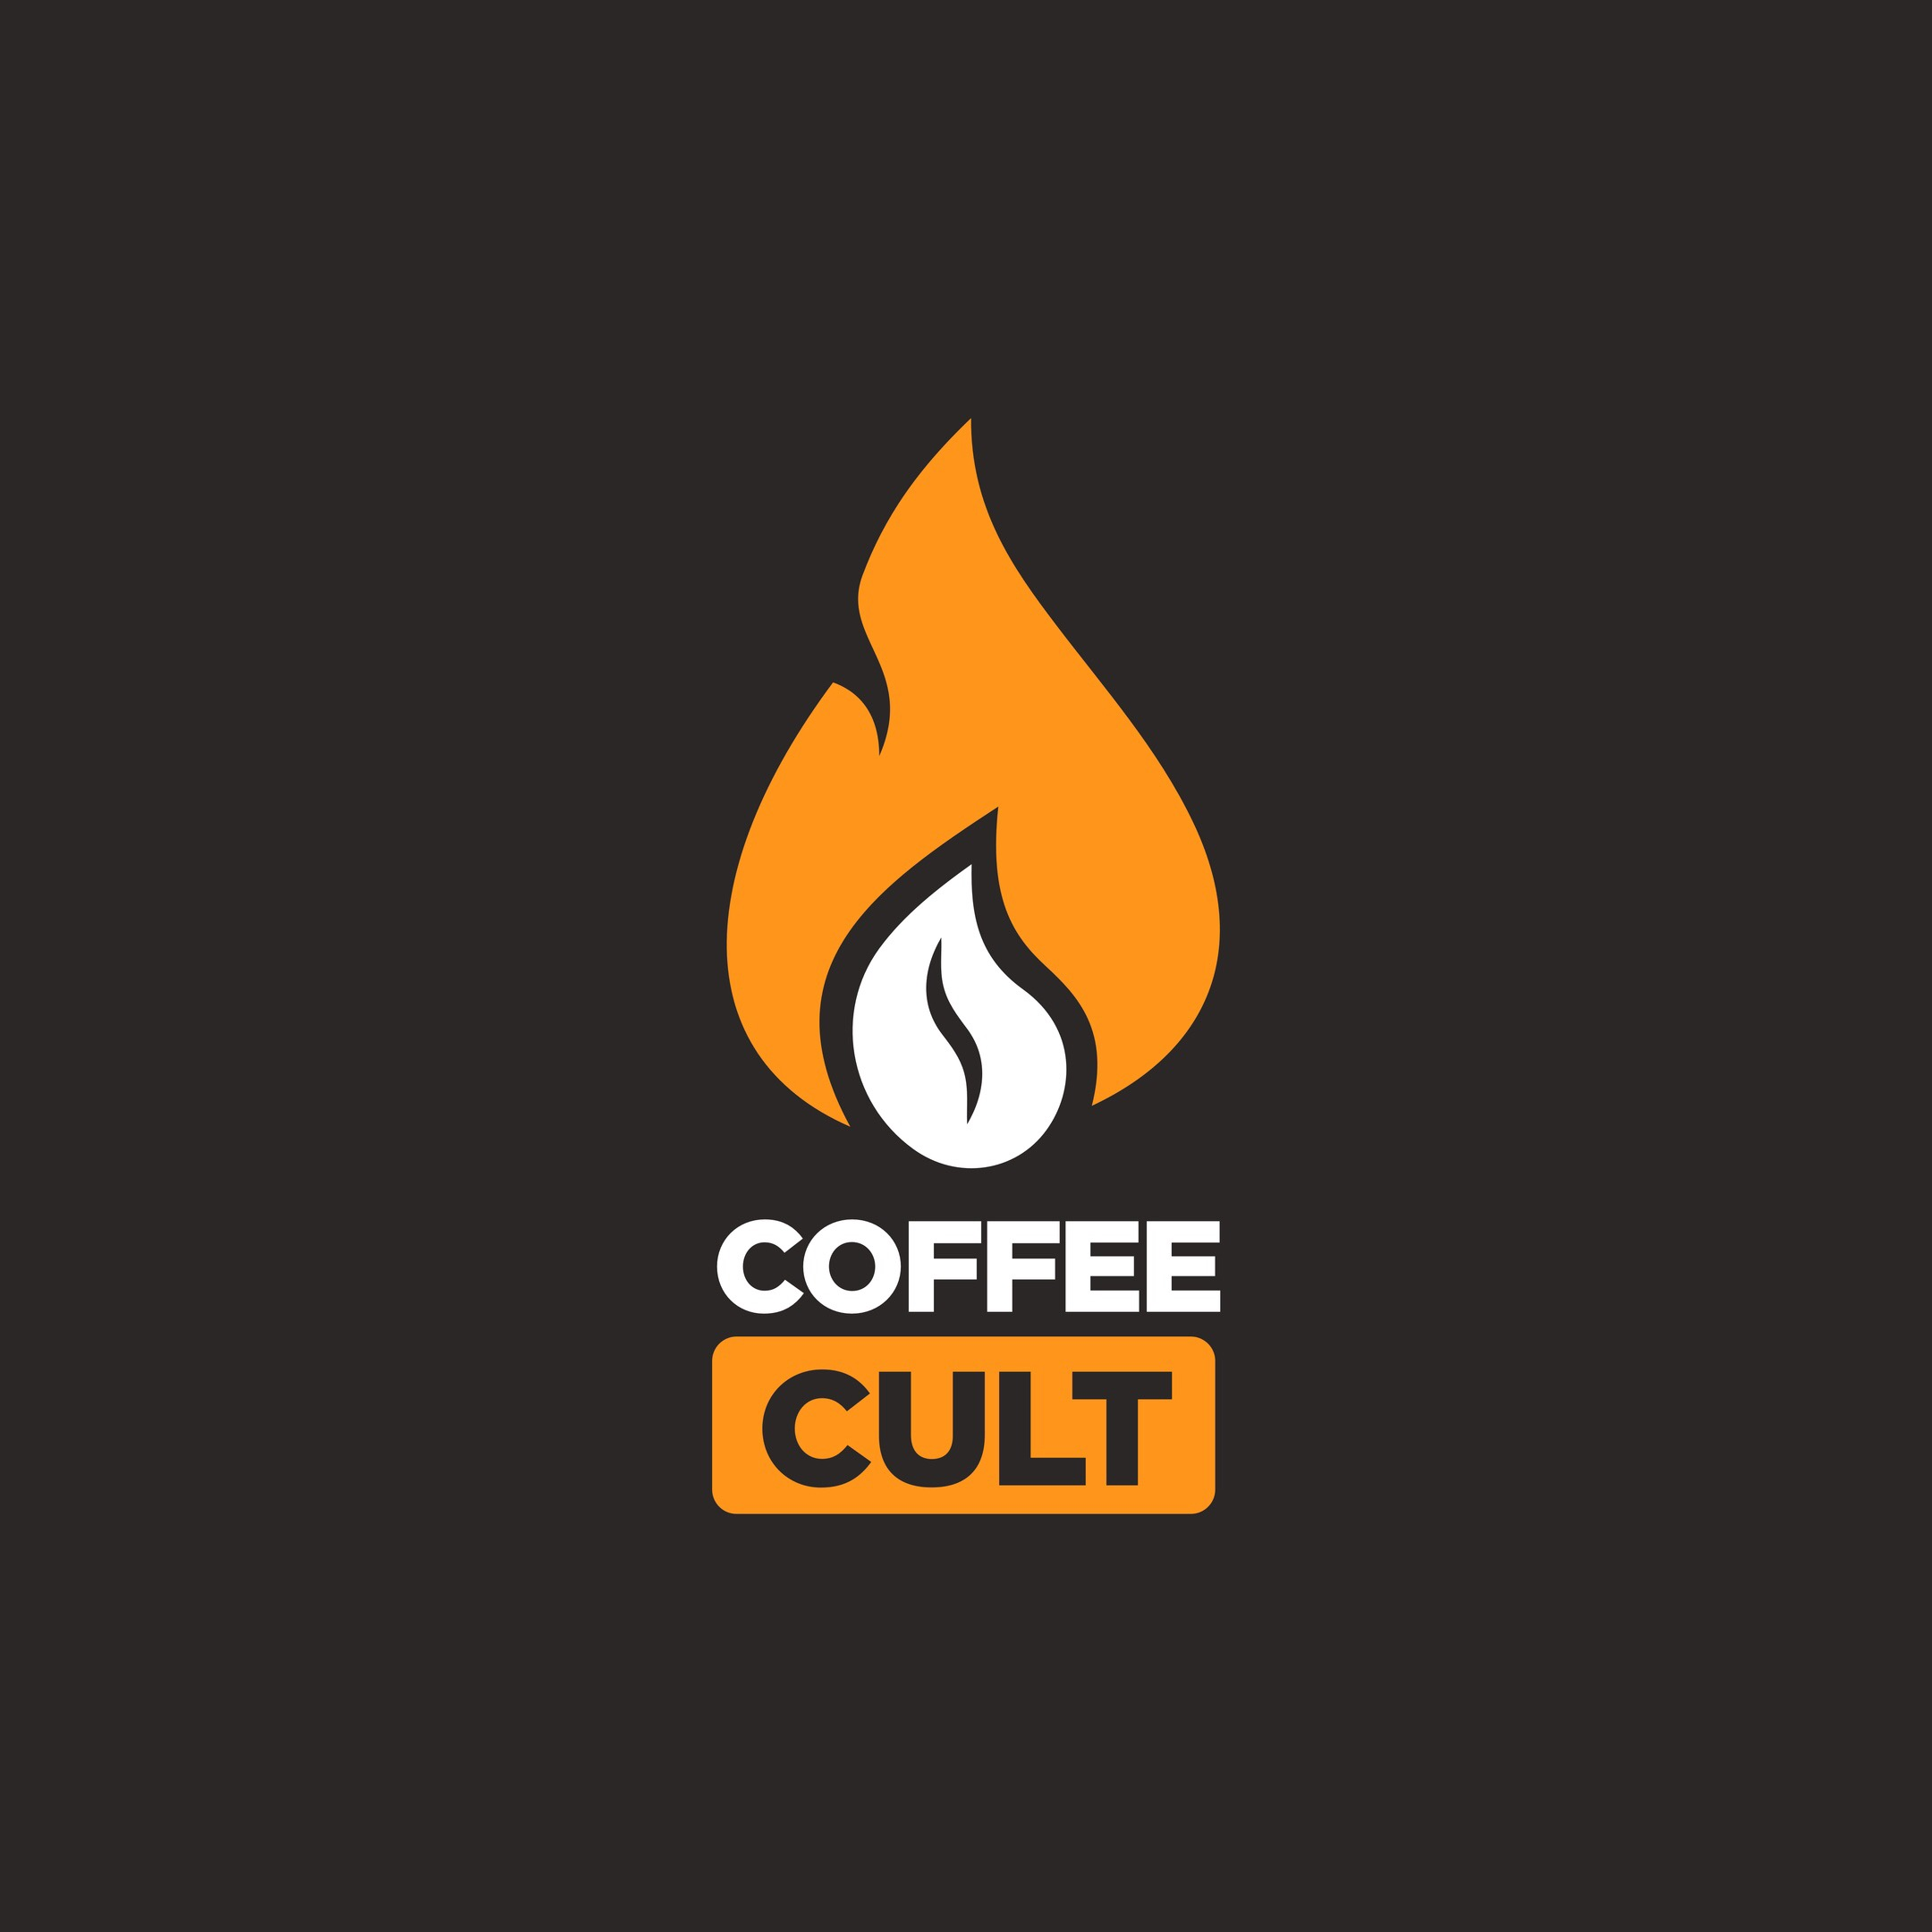 Логотип и фирменный стиль для компании COFFEE CULT фото f_9035bc76d33f14fc.jpg